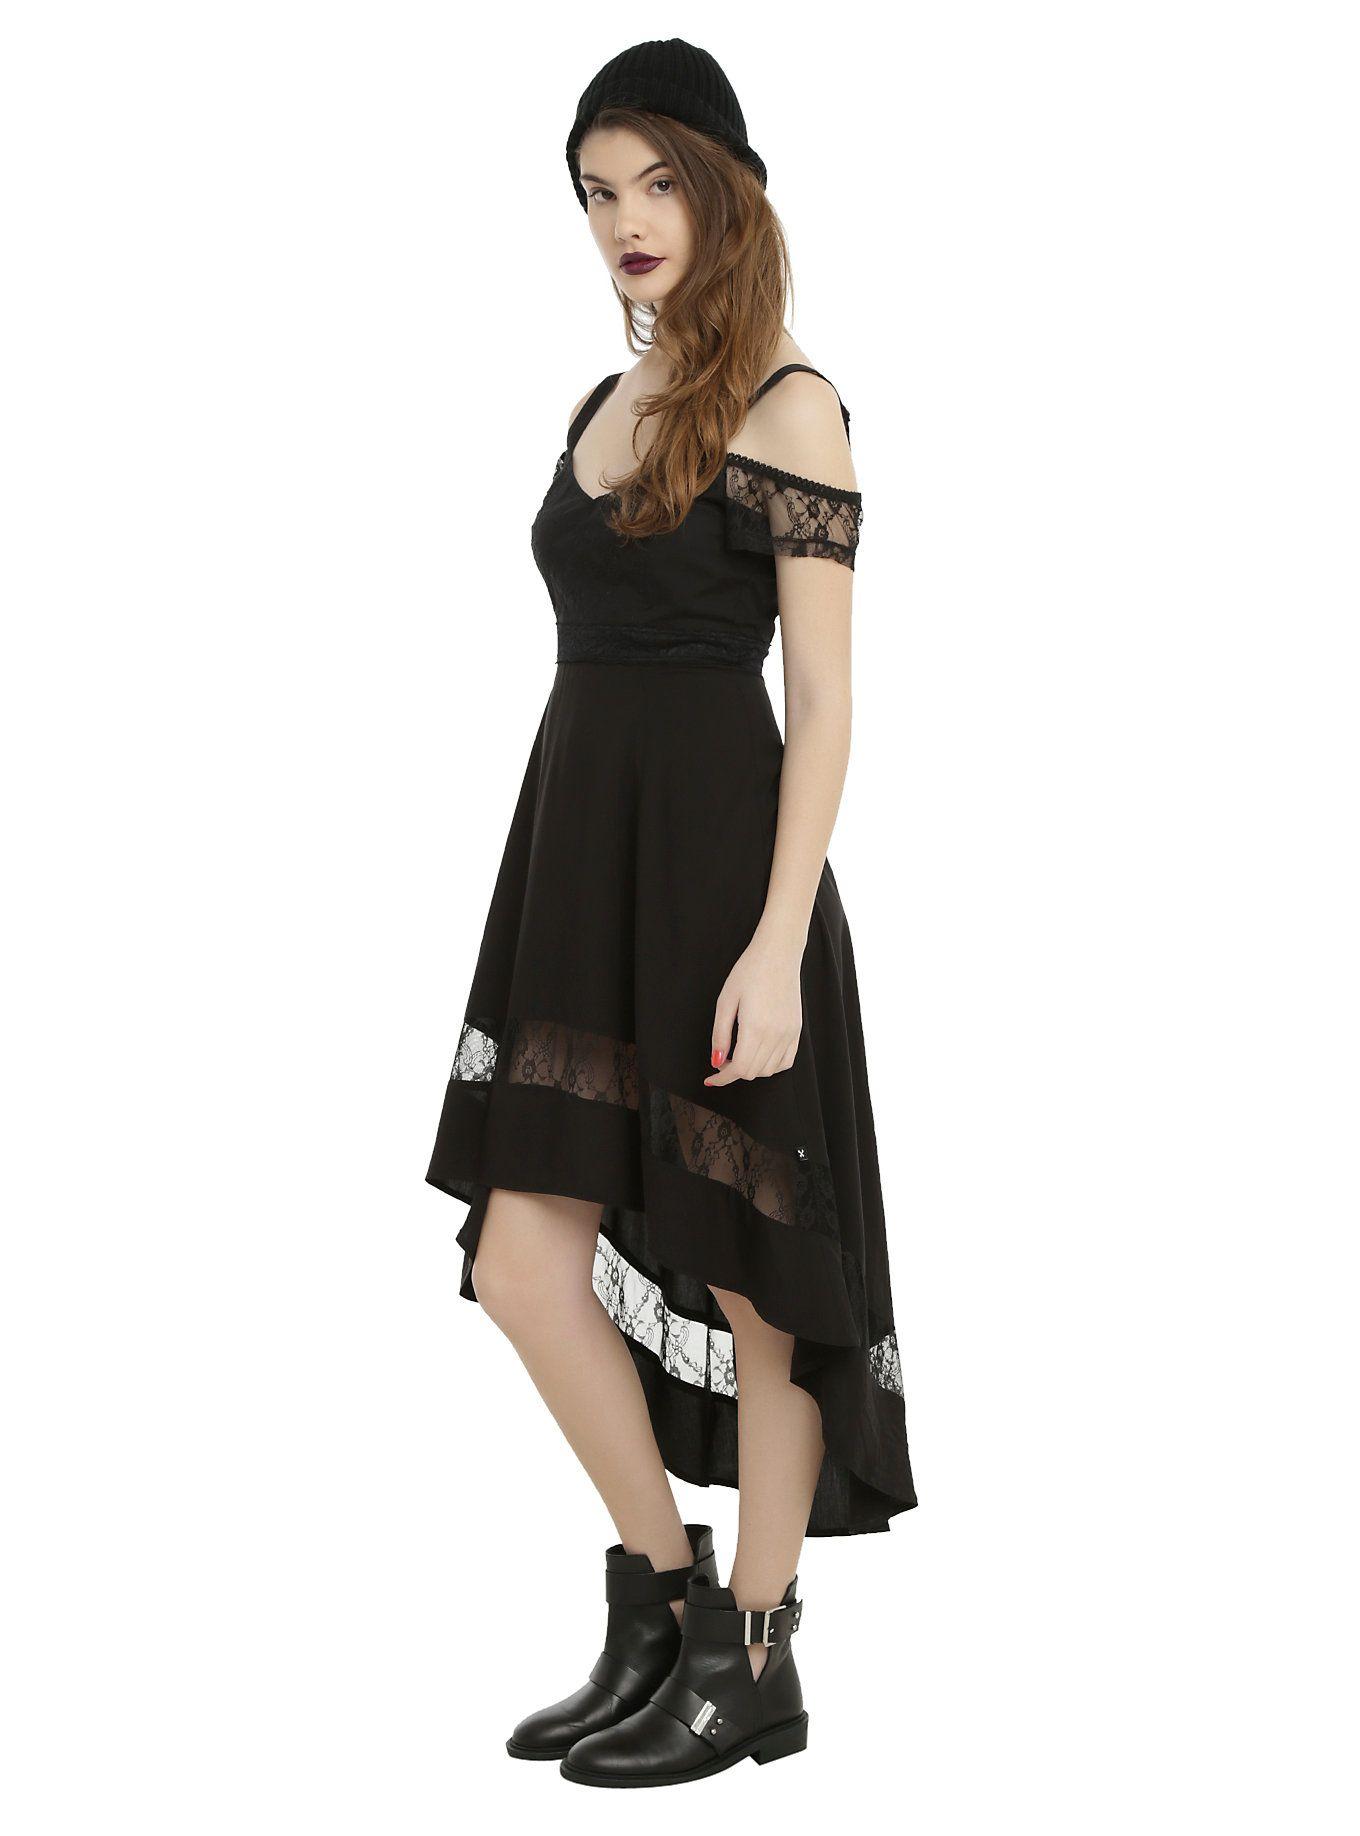 58cb48f8bb Royal Bones By Tripp Black Cold Shoulder Hi-Low Dress